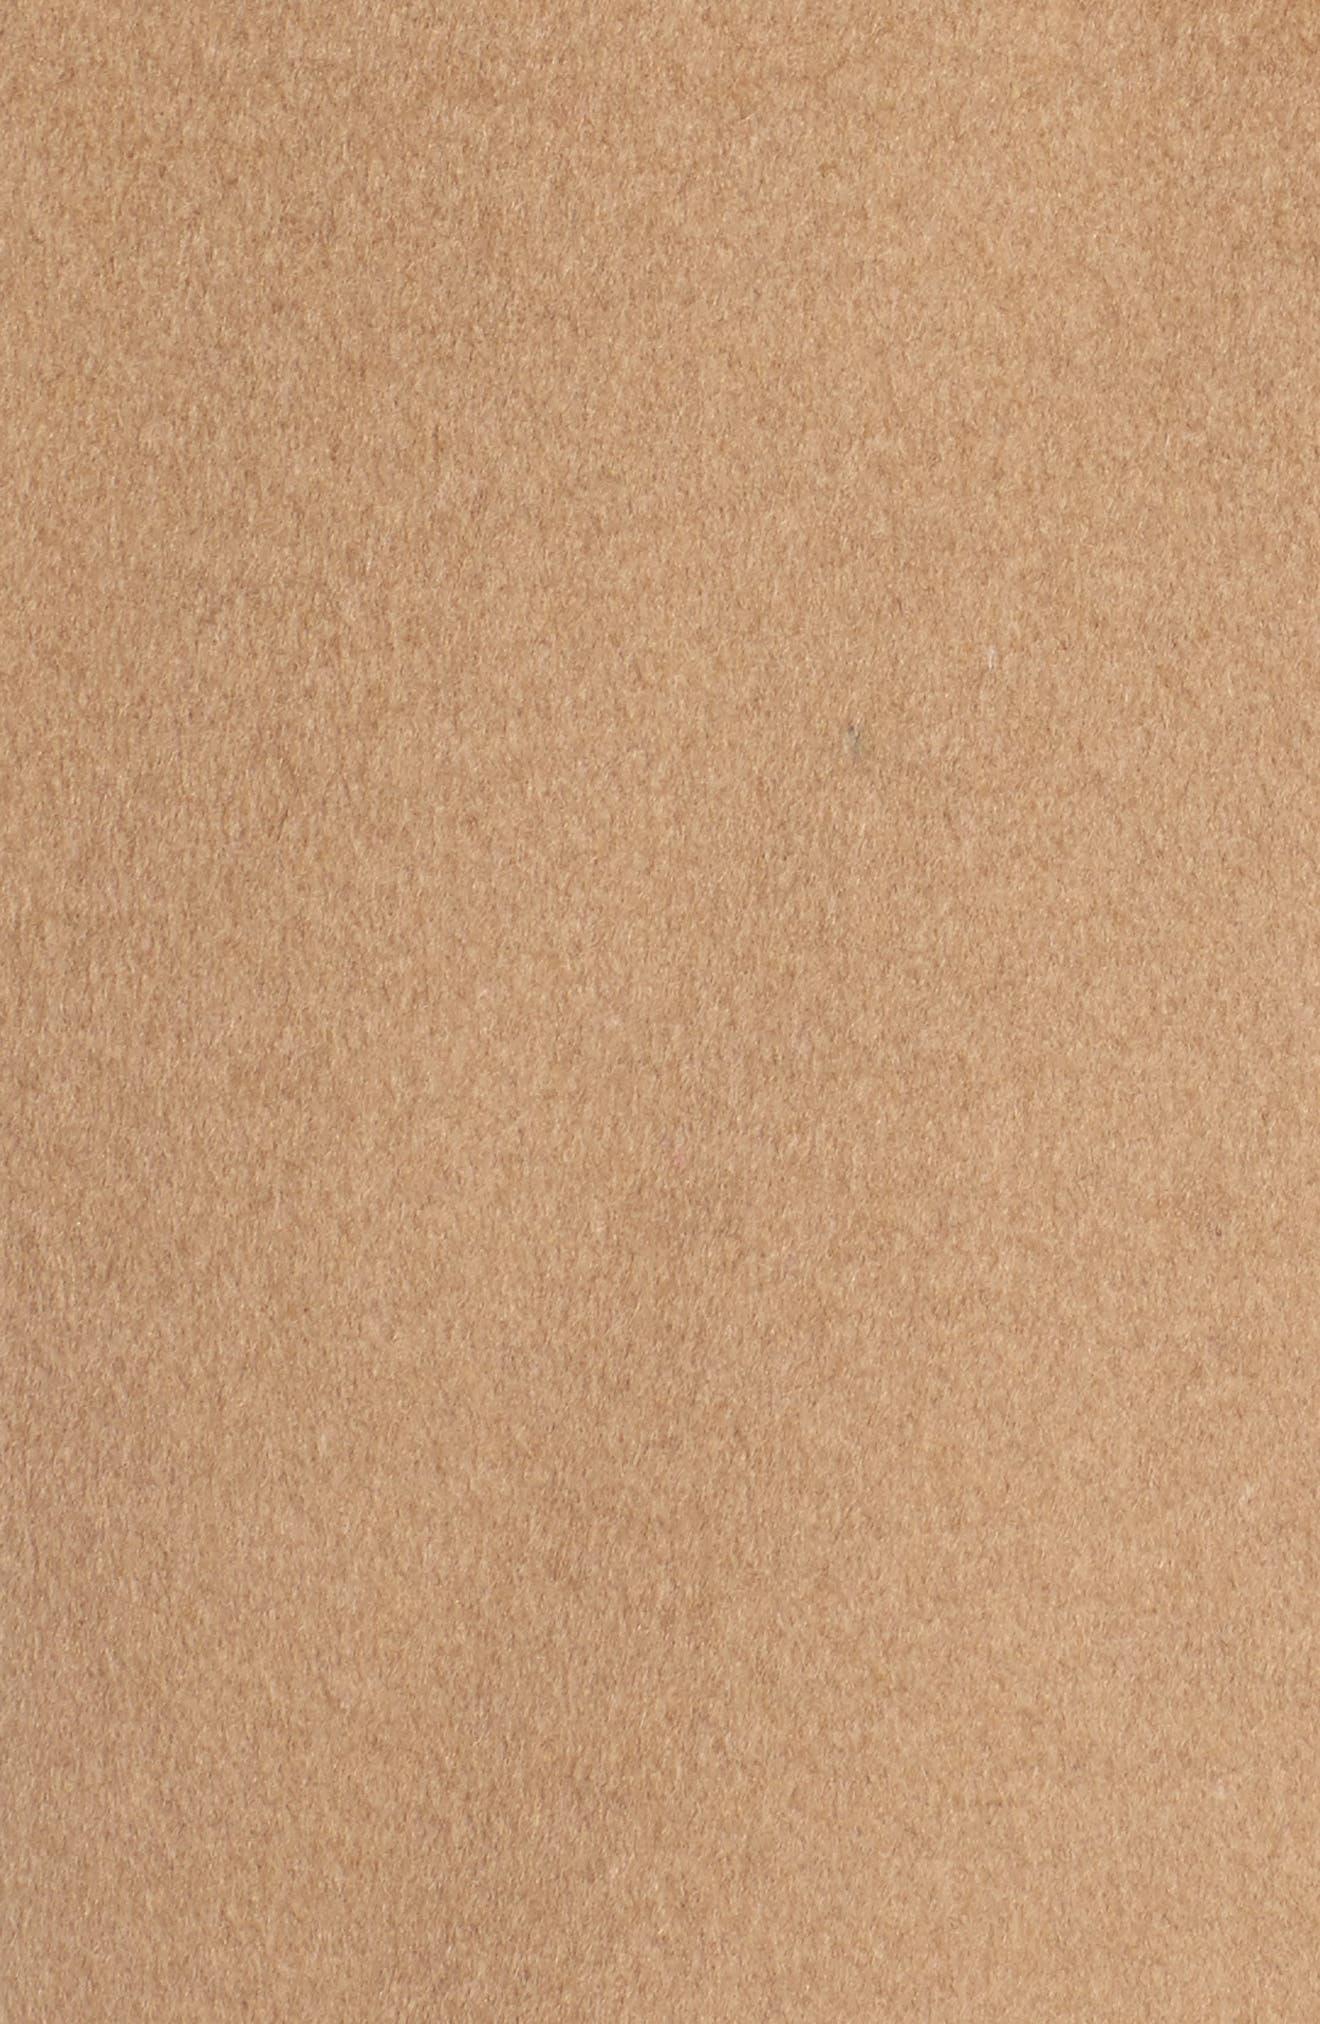 DKNY Wool Blend Shawl Collar Wrap Coat,                             Alternate thumbnail 5, color,                             Camel